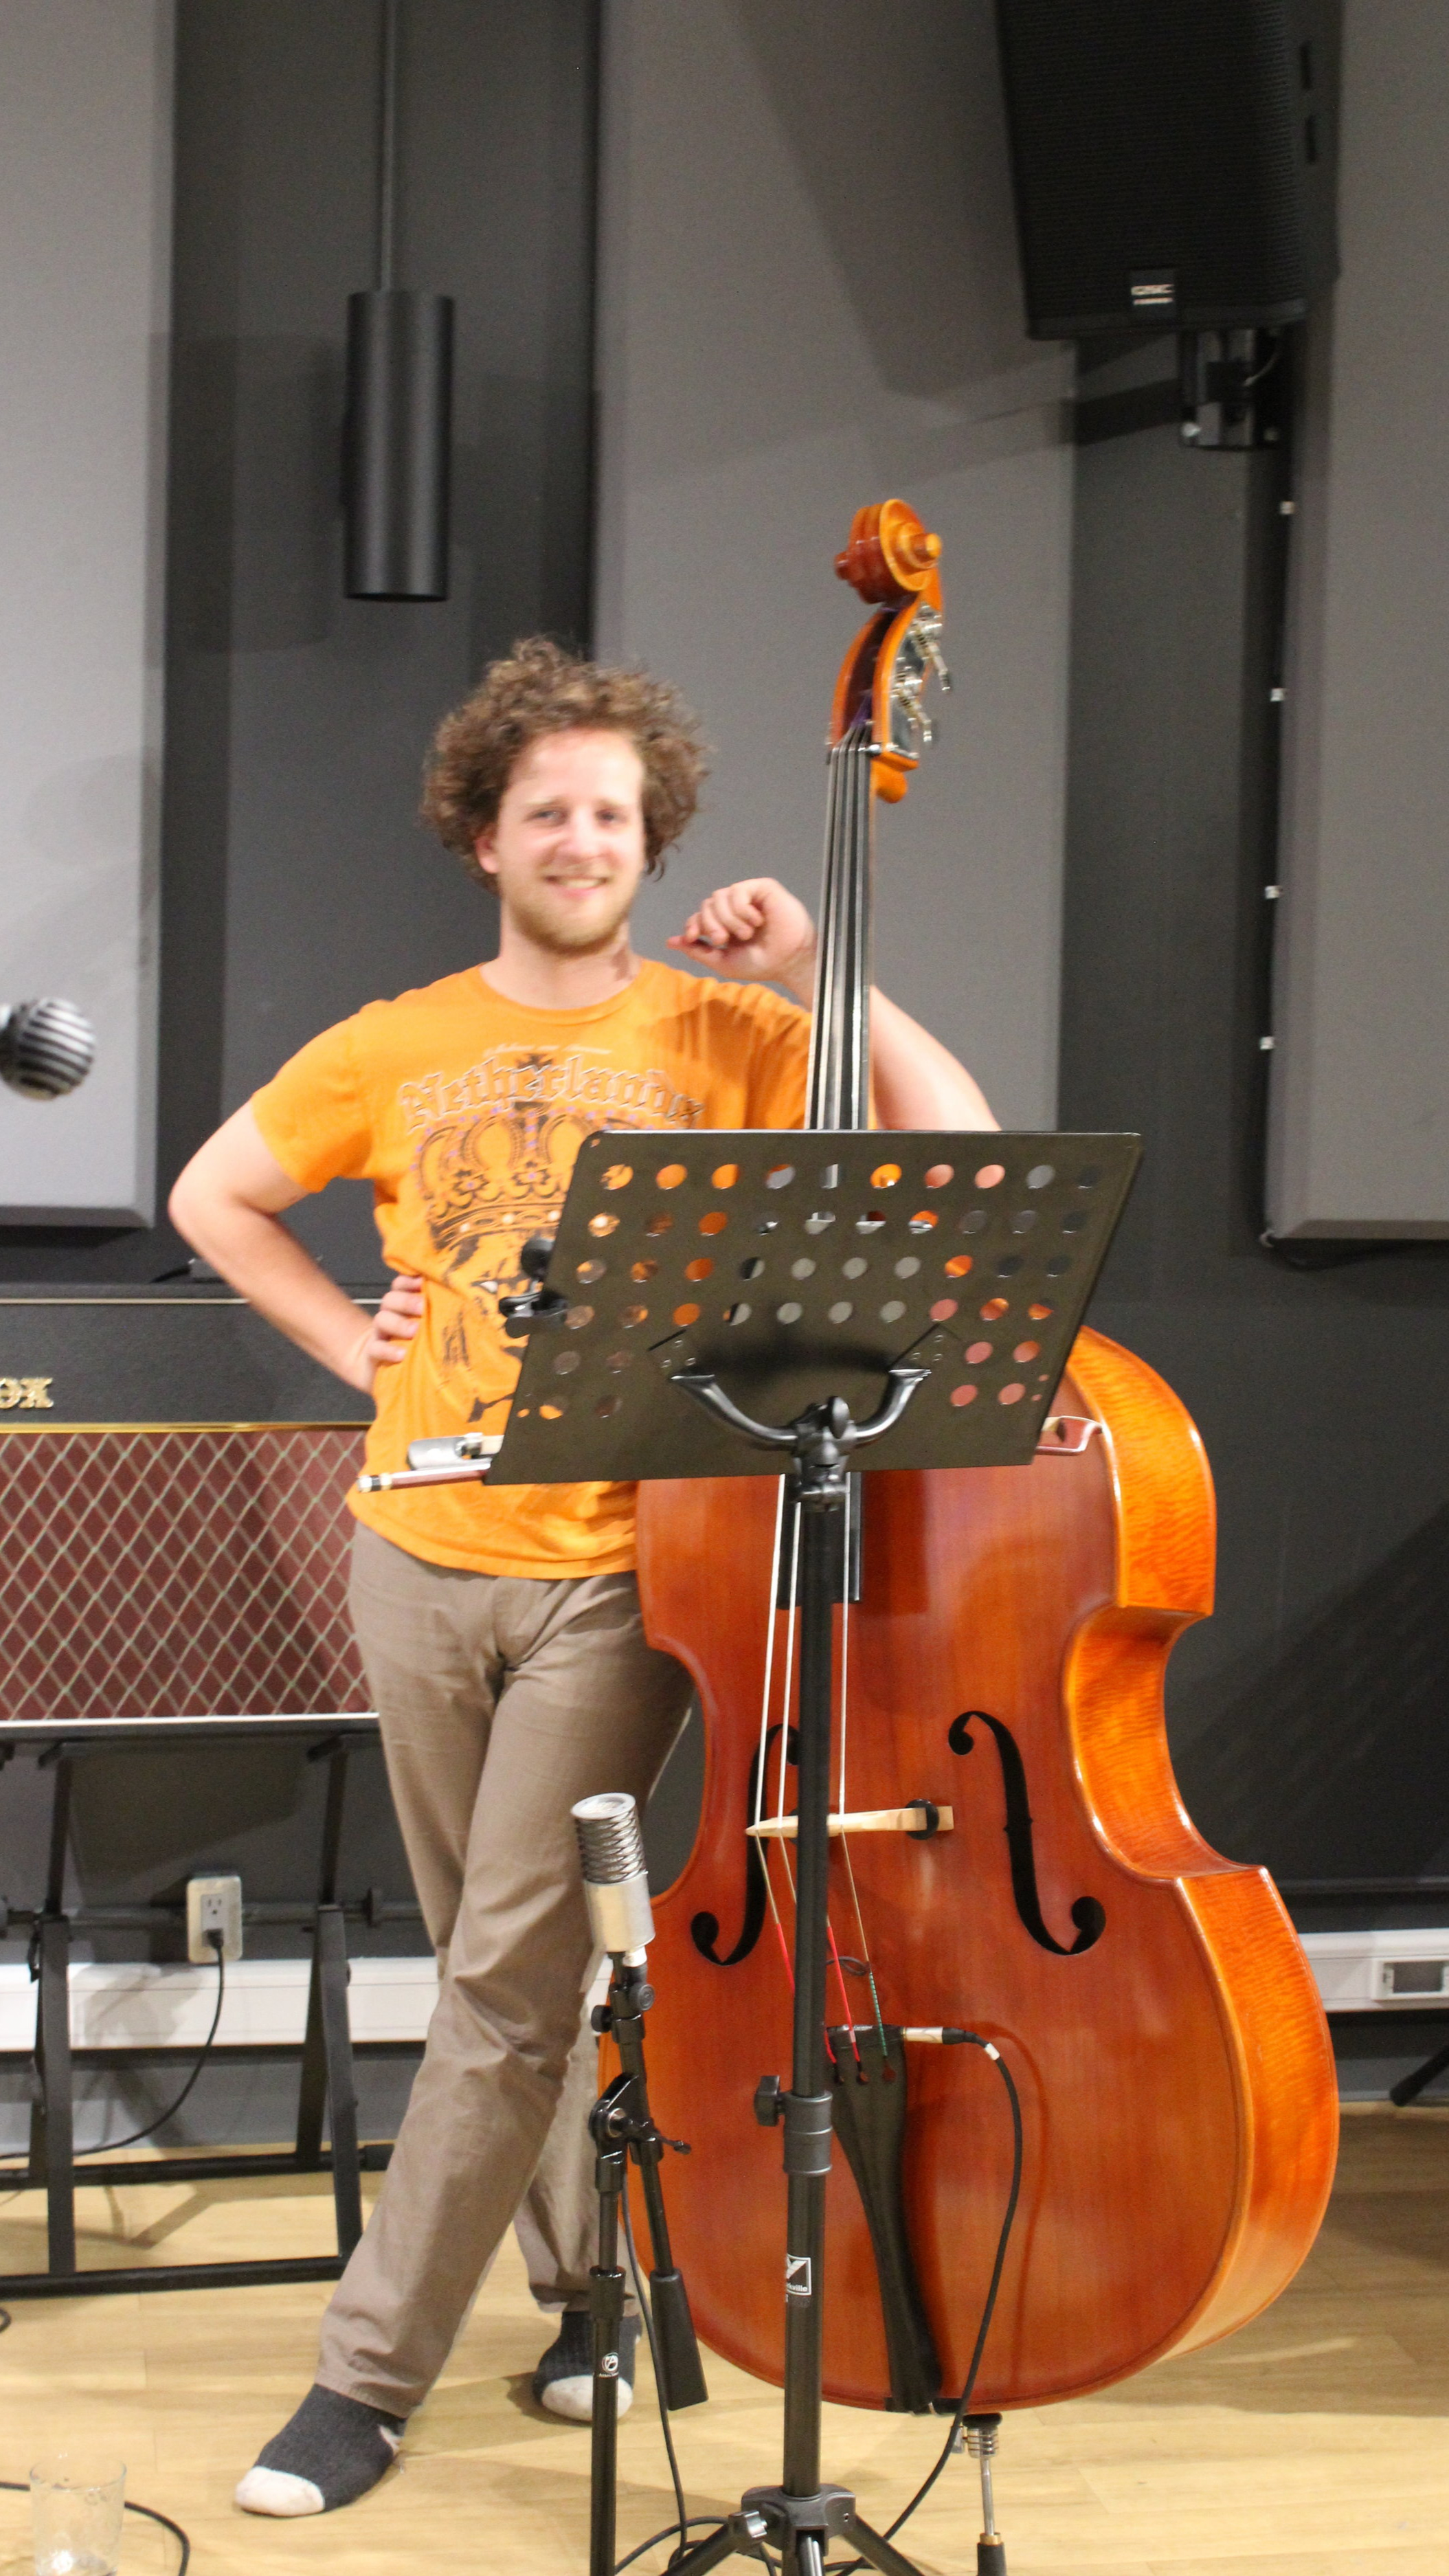 Chris Adriaanse, Lynx studio, Alluvial Plain